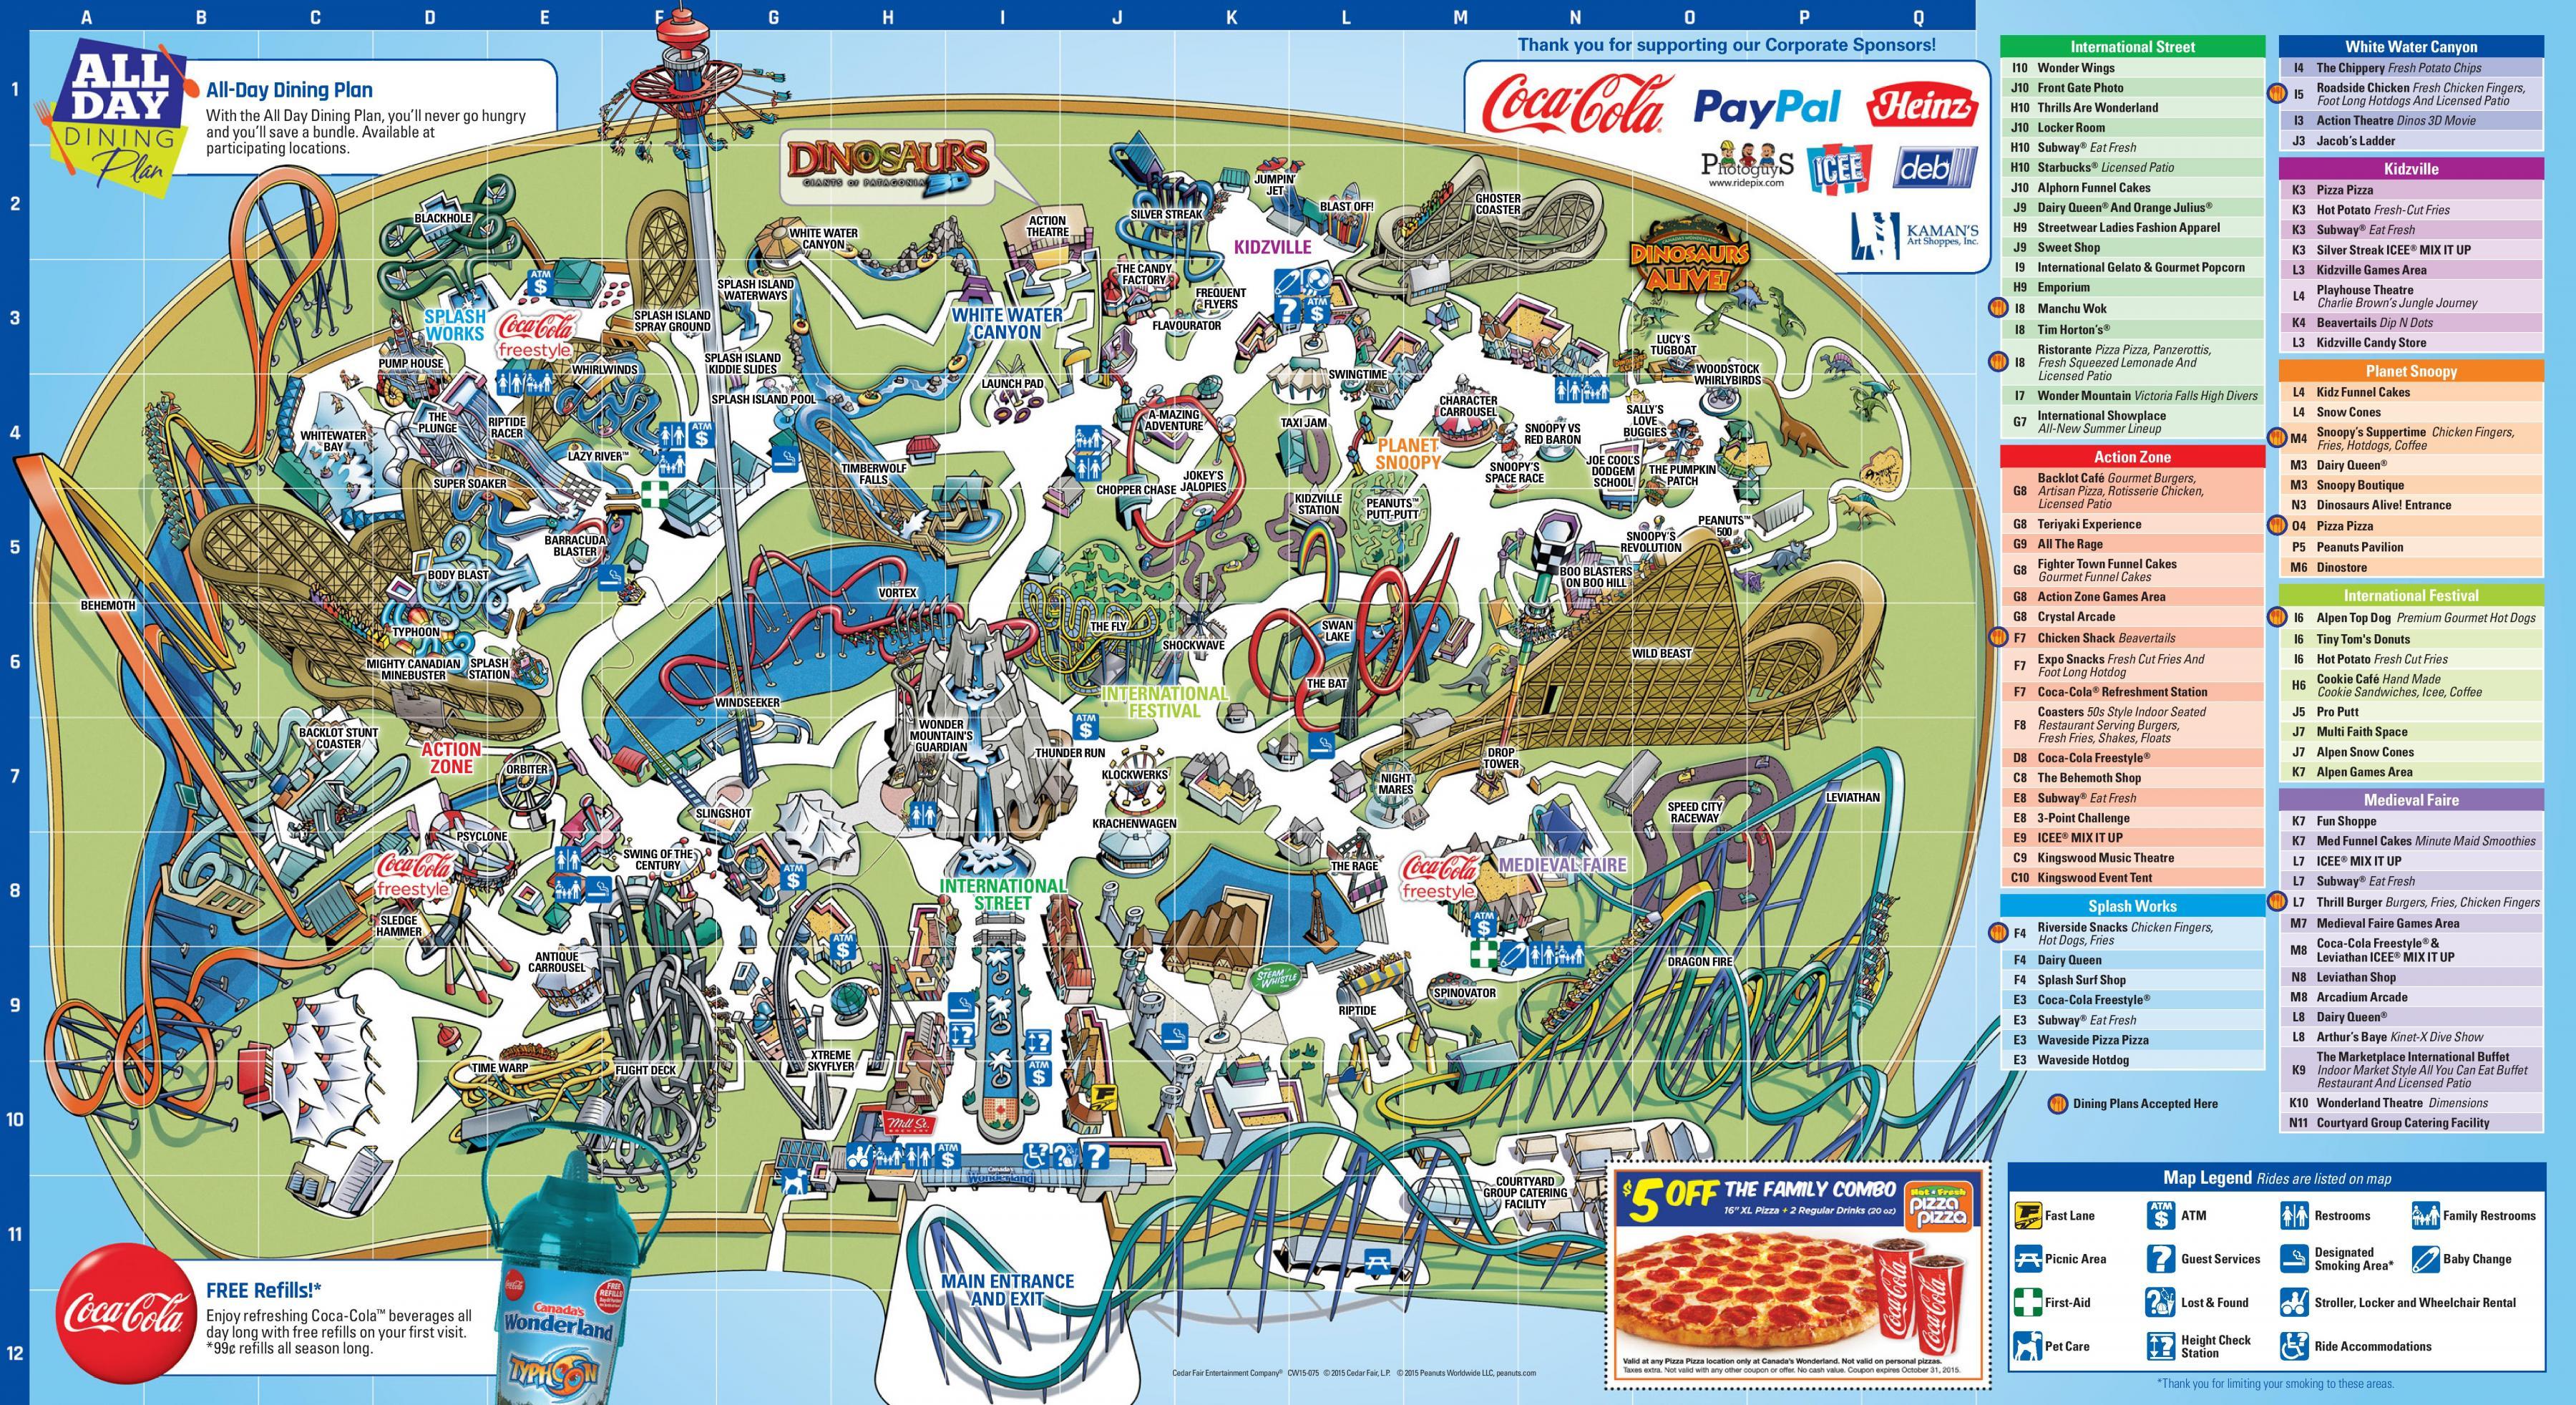 Karta Pa Kanada.Canada S Wonderland Karta Karta Av Canada S Wonderland Kanada